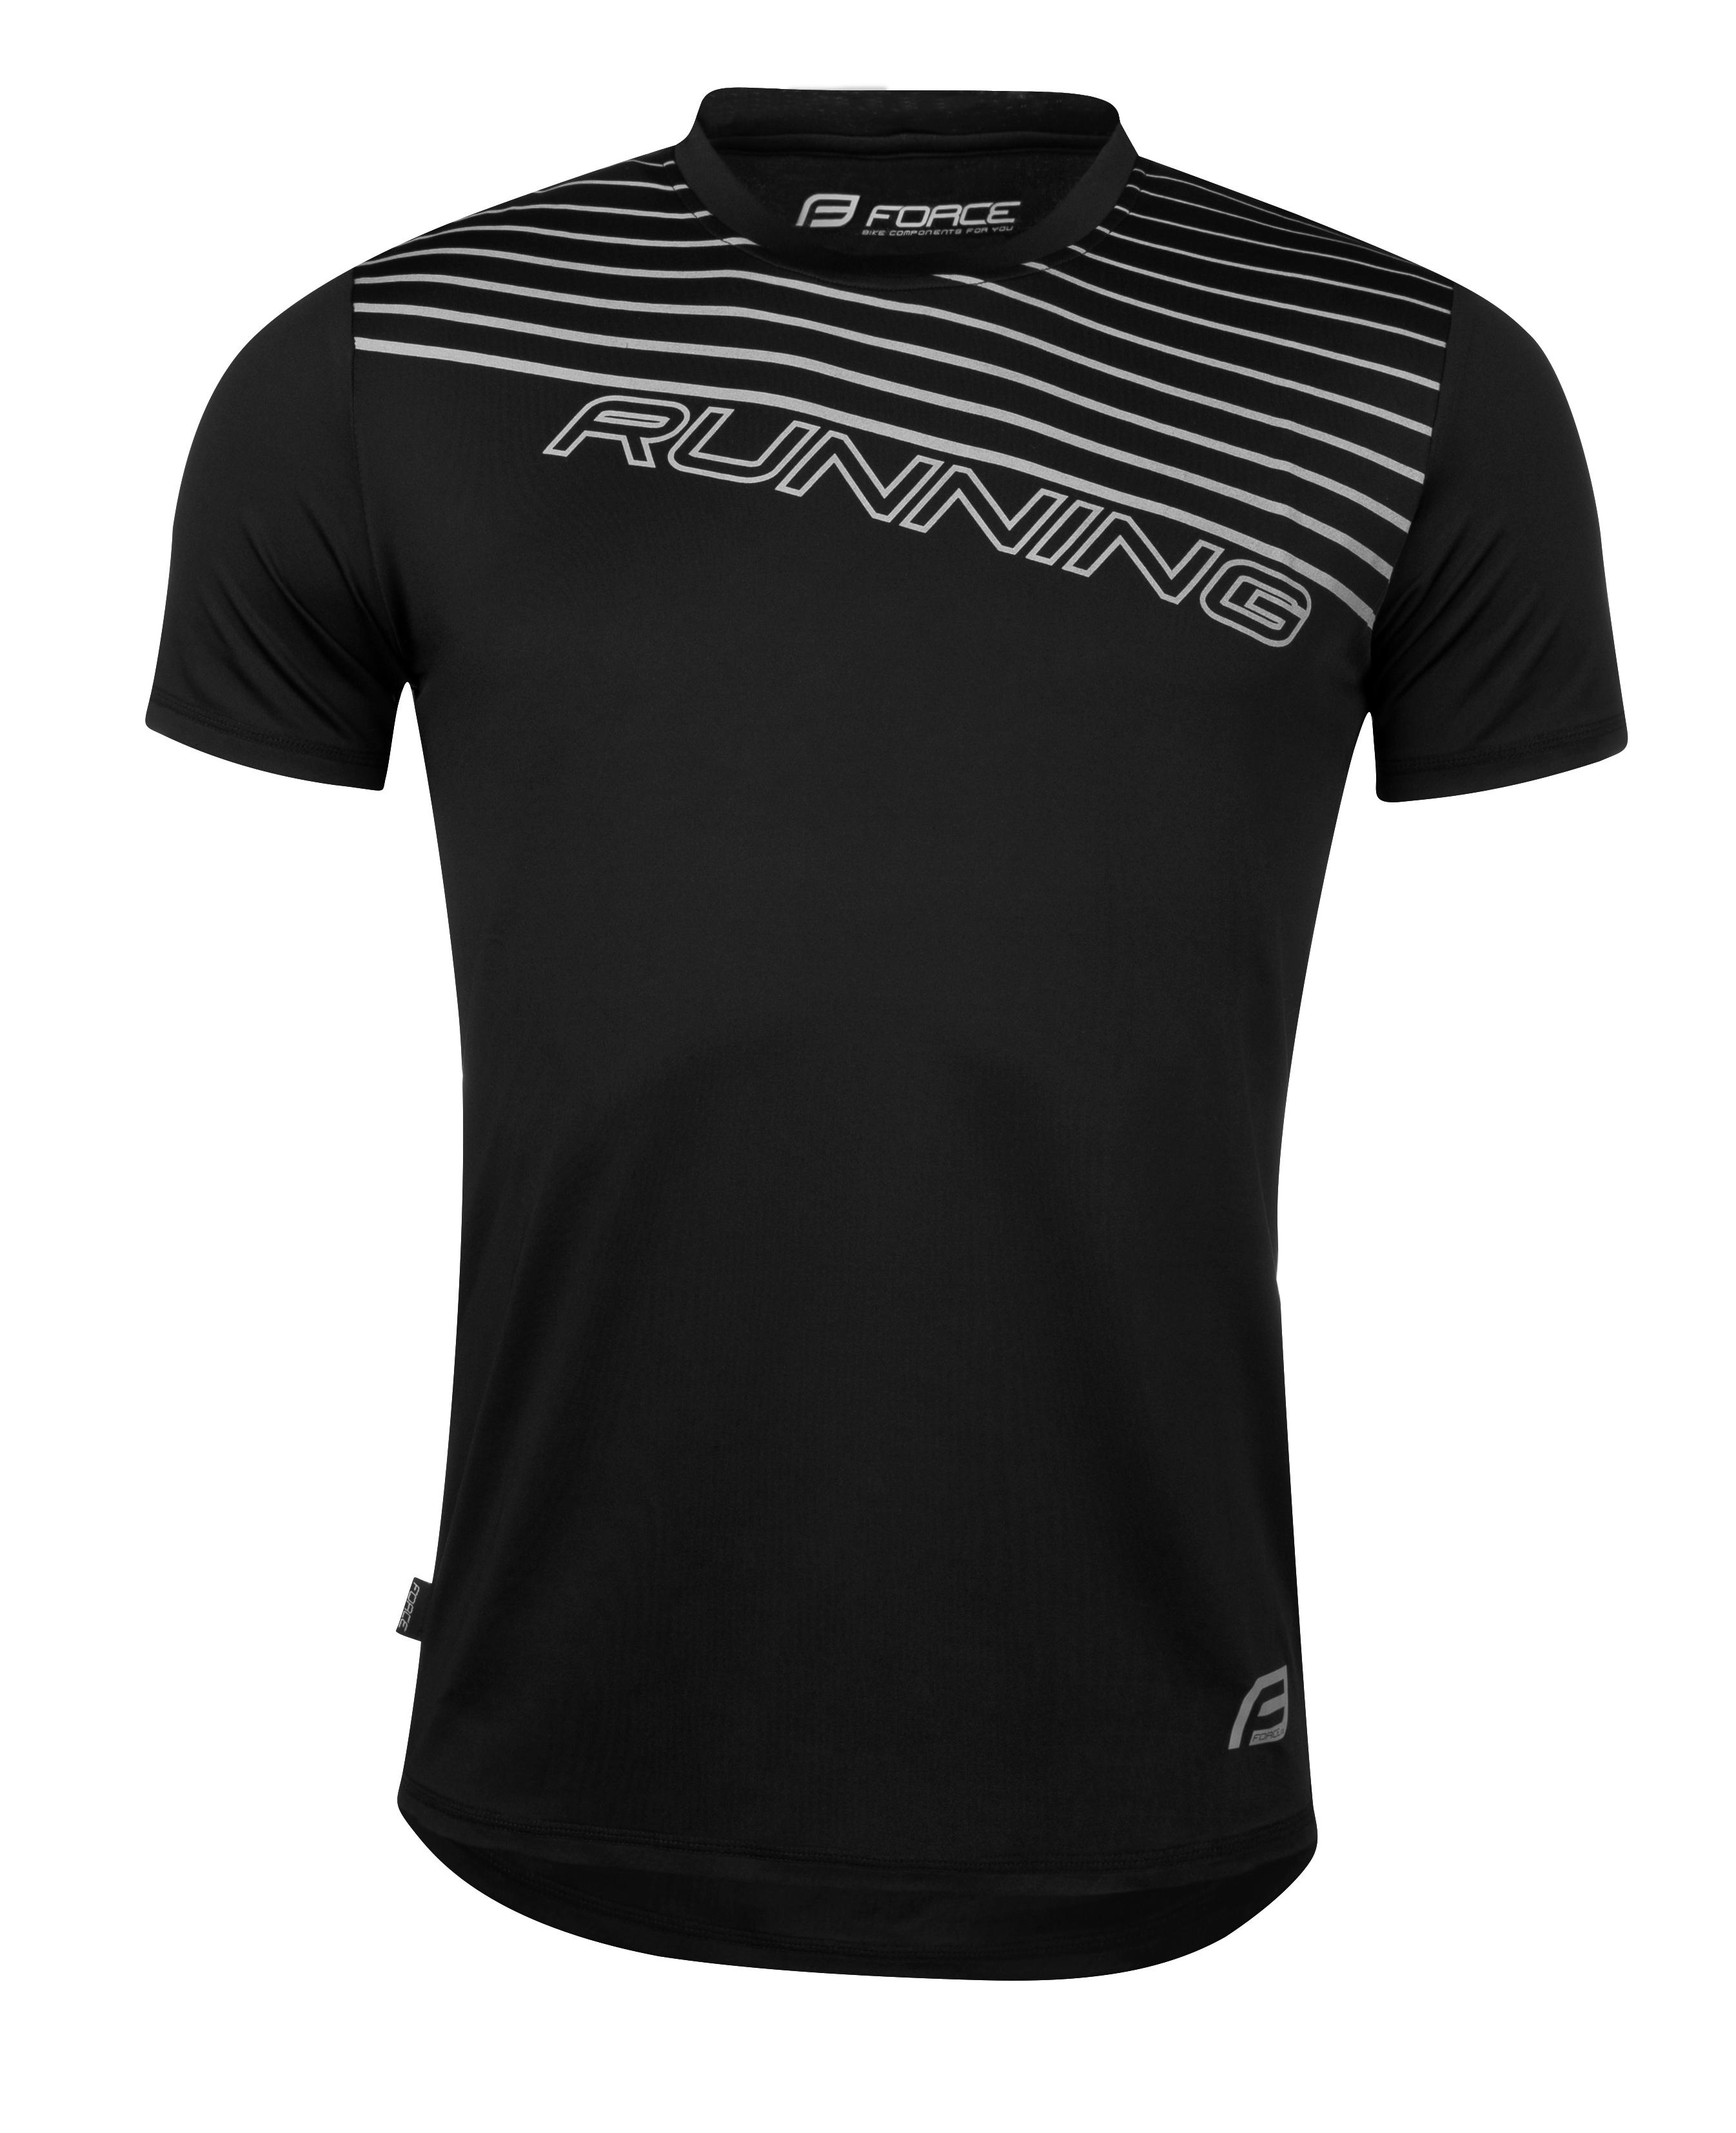 triko běžecké FORCE RUNNING, černé XS